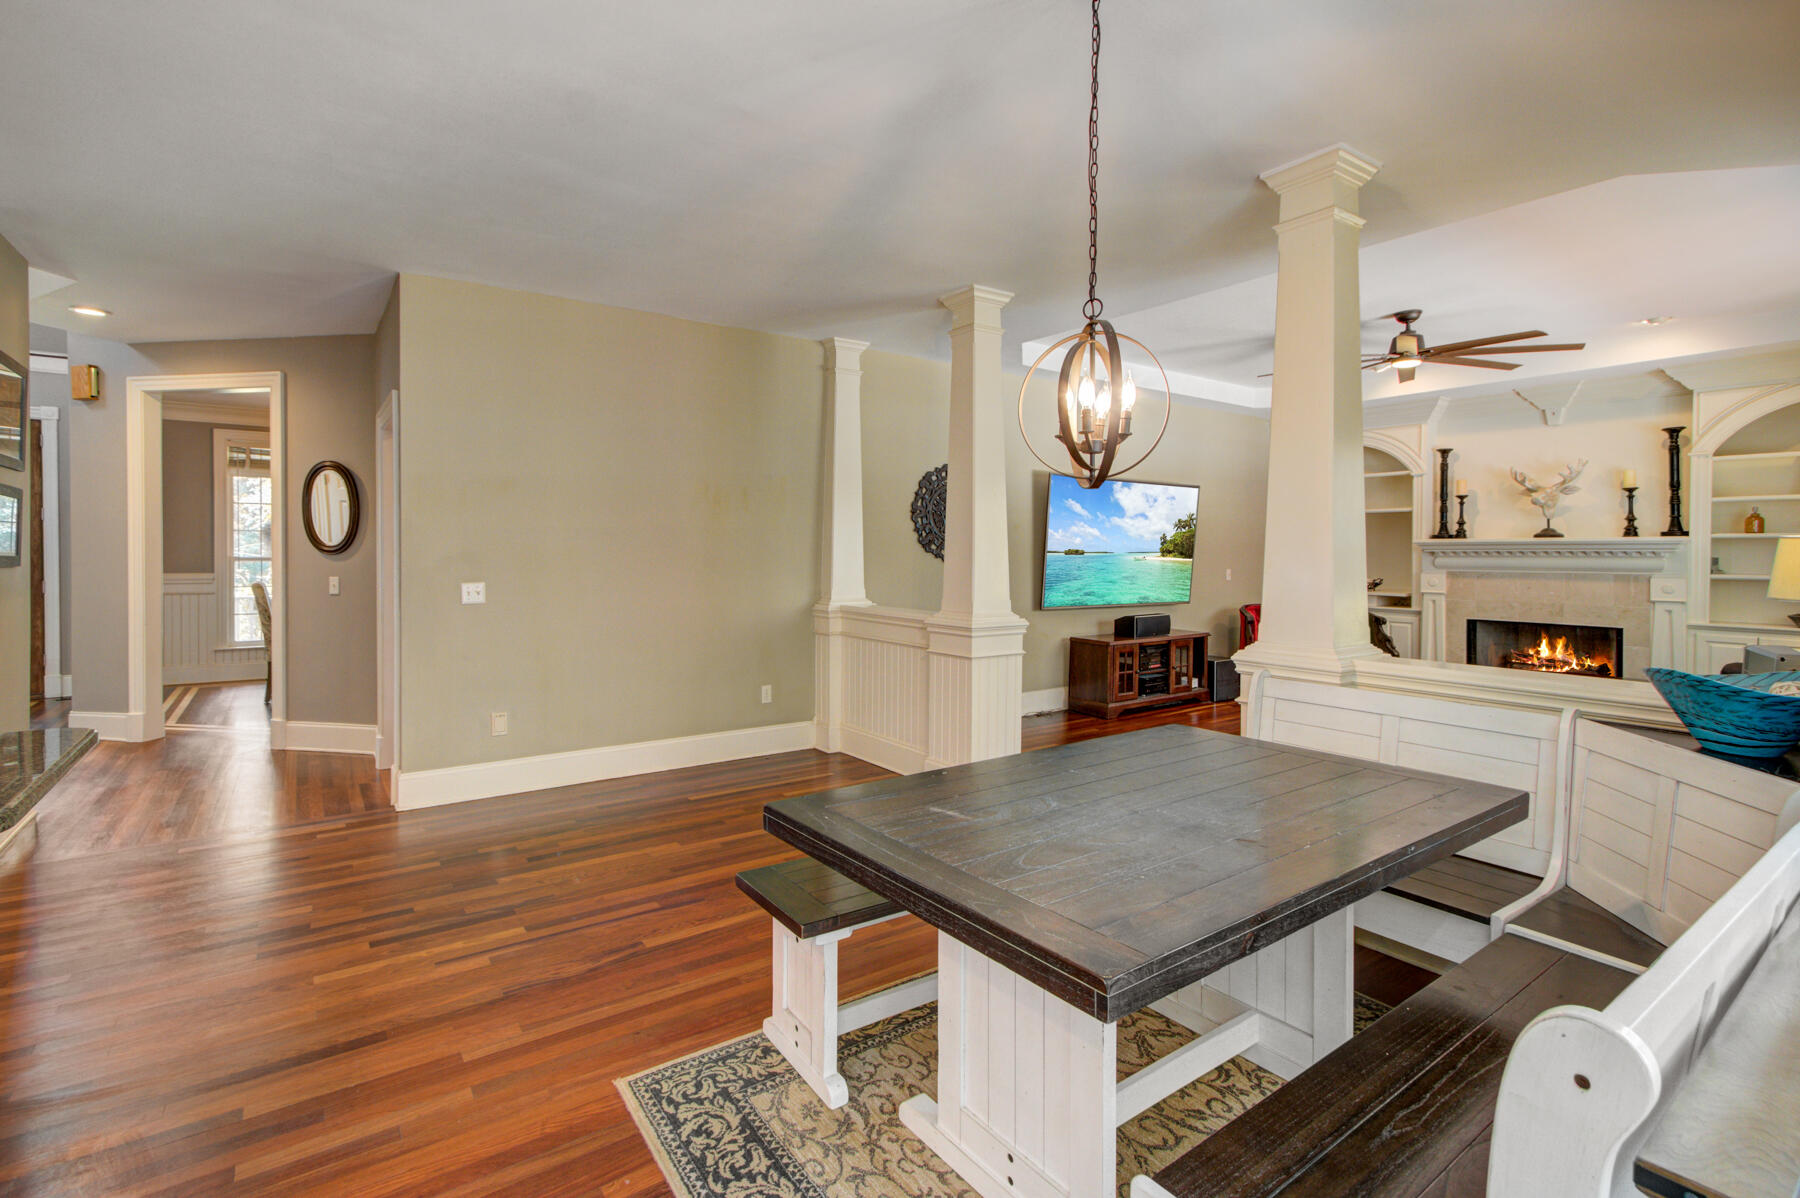 Dunes West Homes For Sale - 3095 Pignatelli, Mount Pleasant, SC - 8